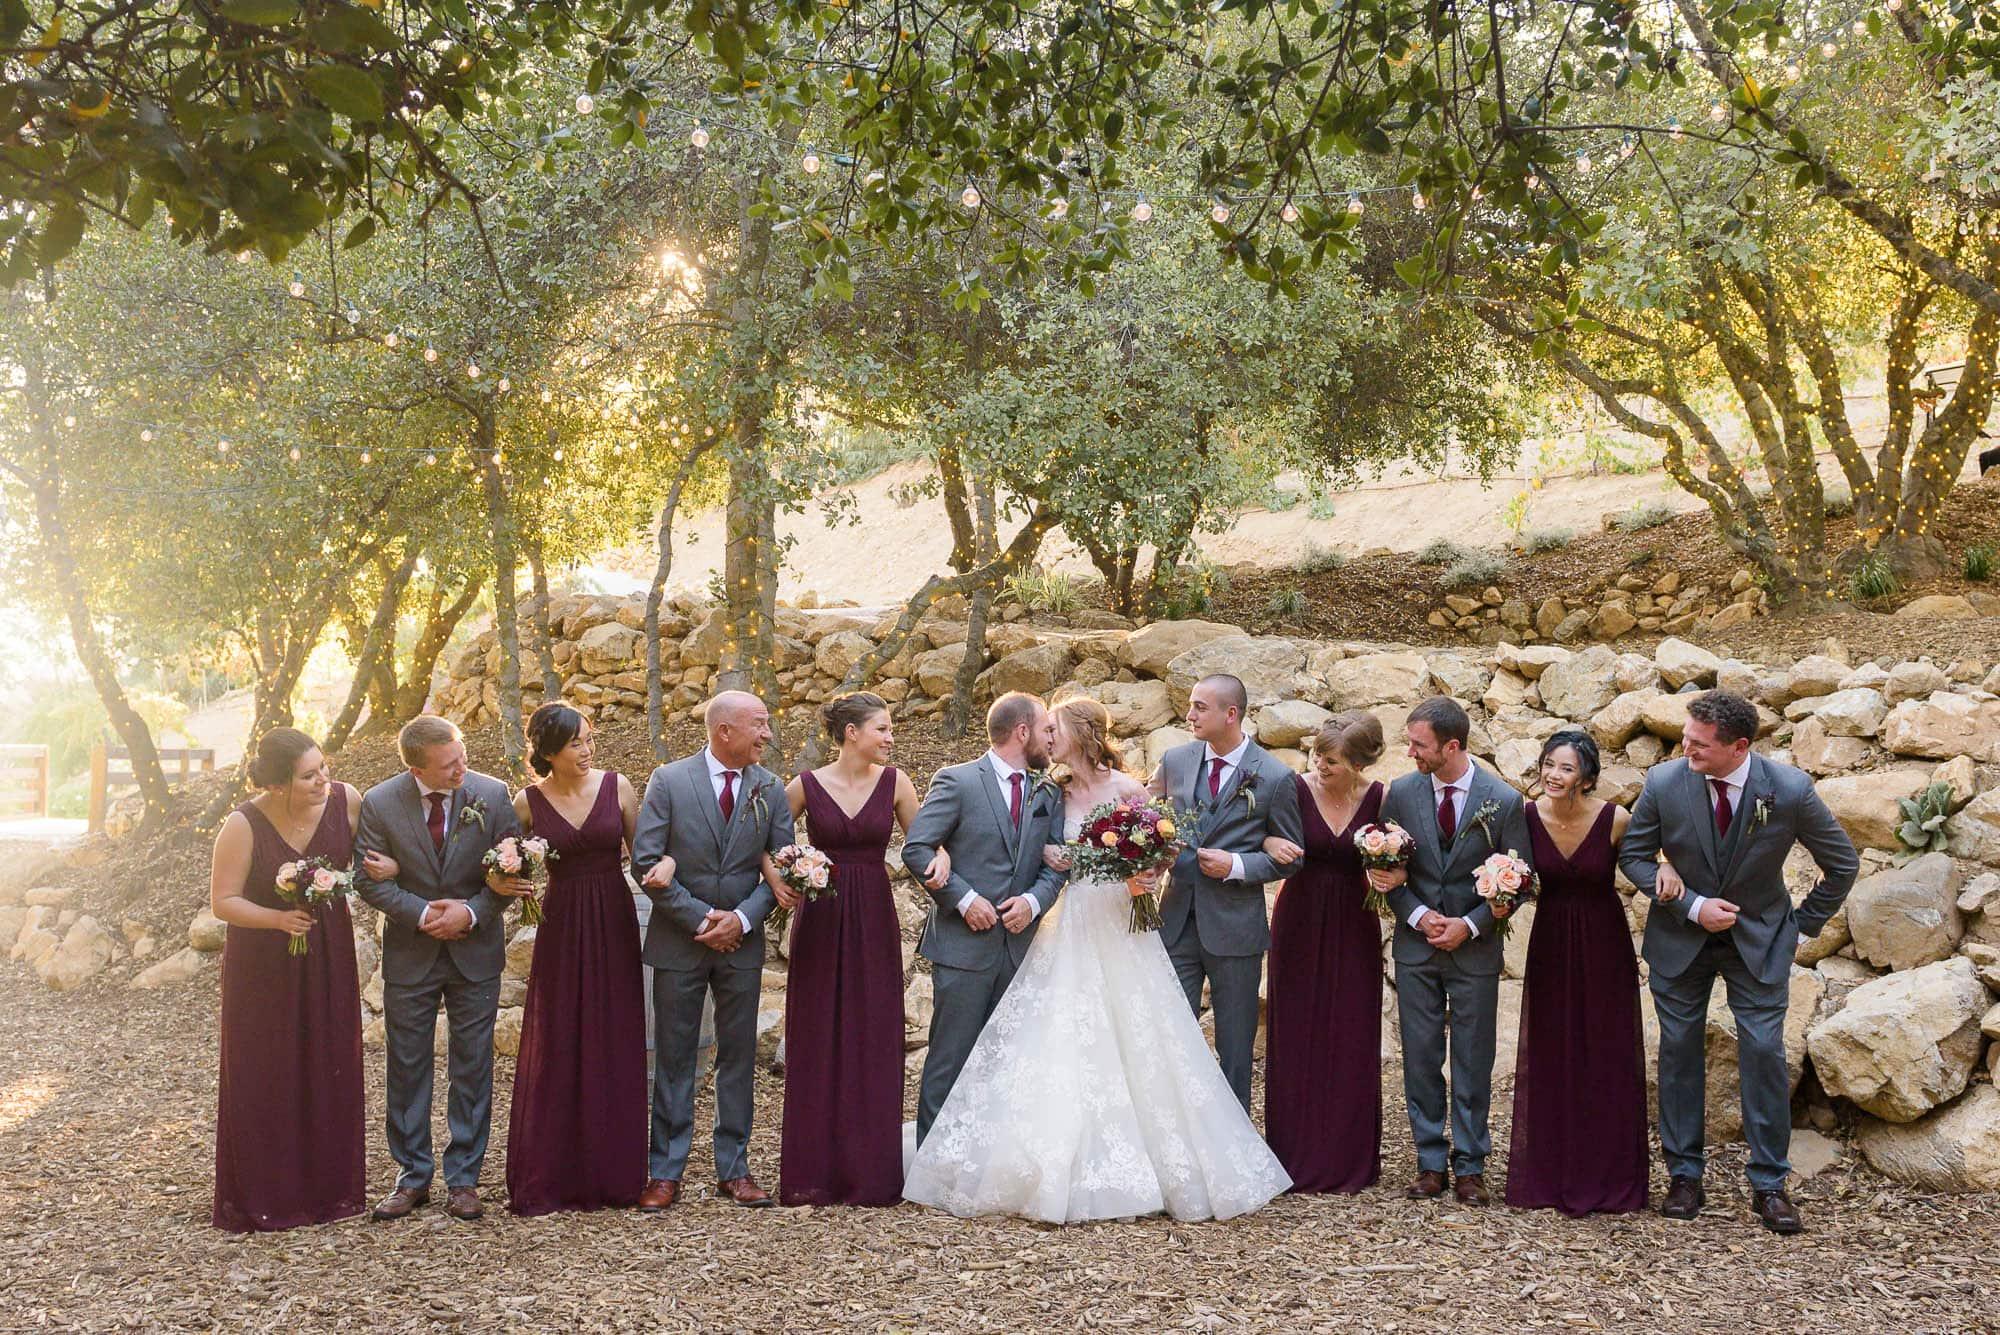 369_Alan_and_Heidi_Serendipity_Garden_Wedding_10-27-2018